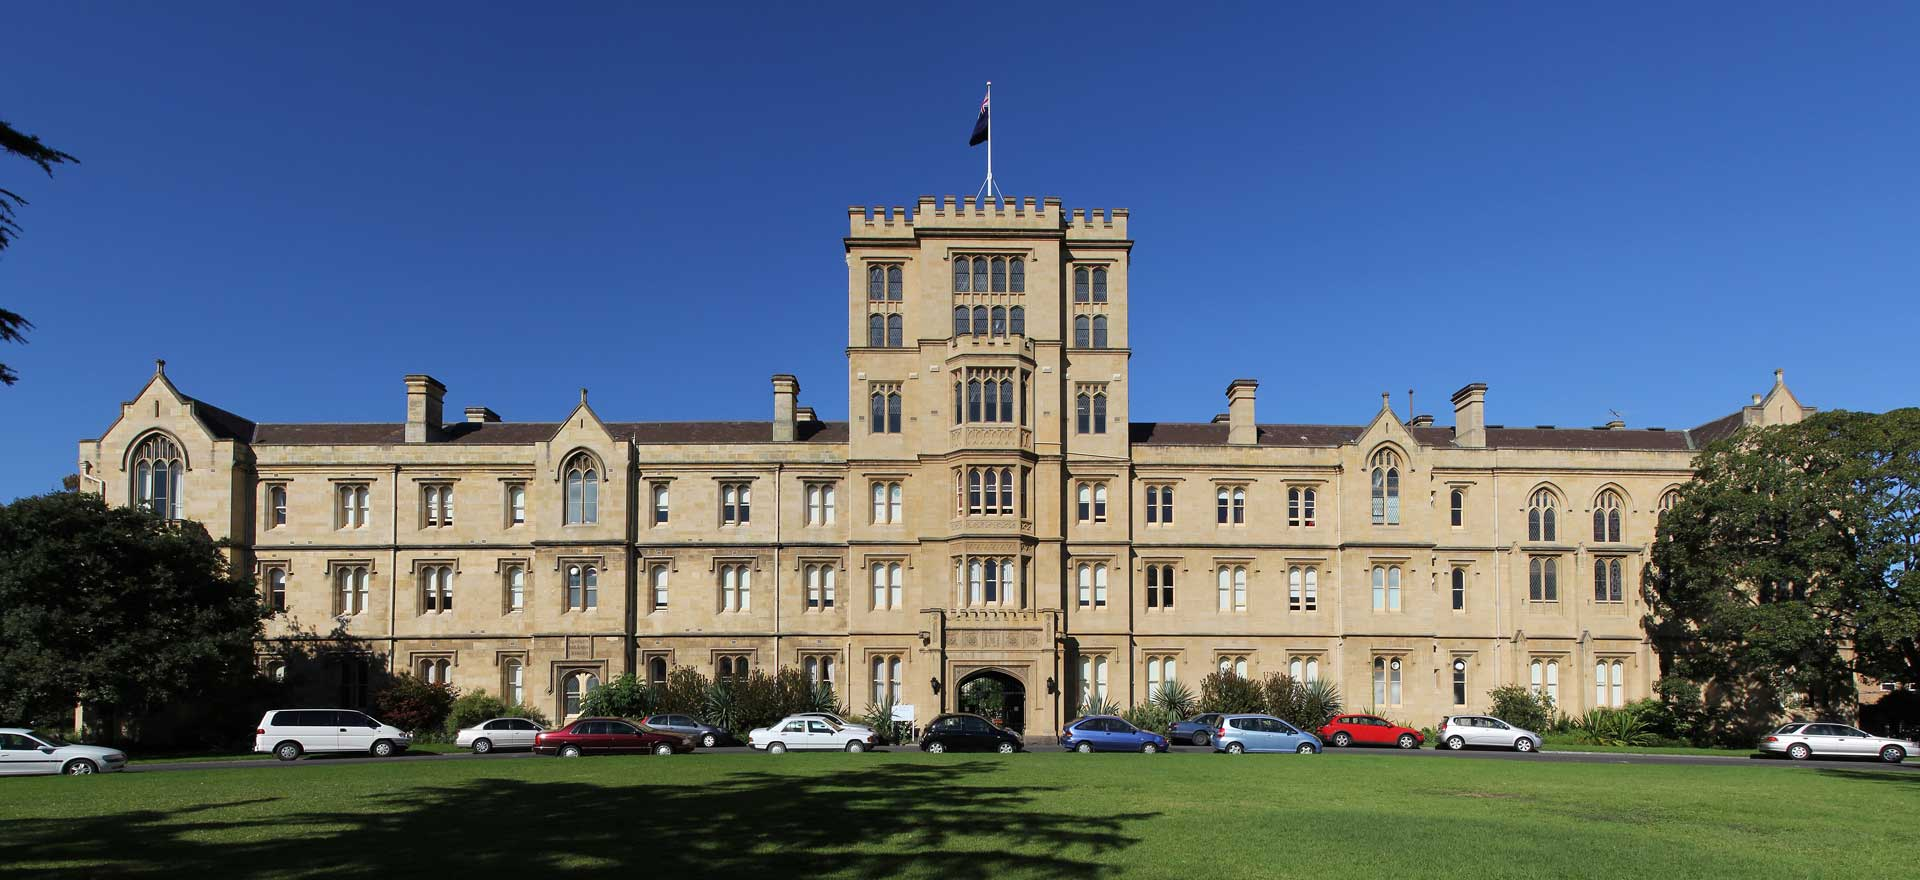 University of Melbourne, Úc, parkville